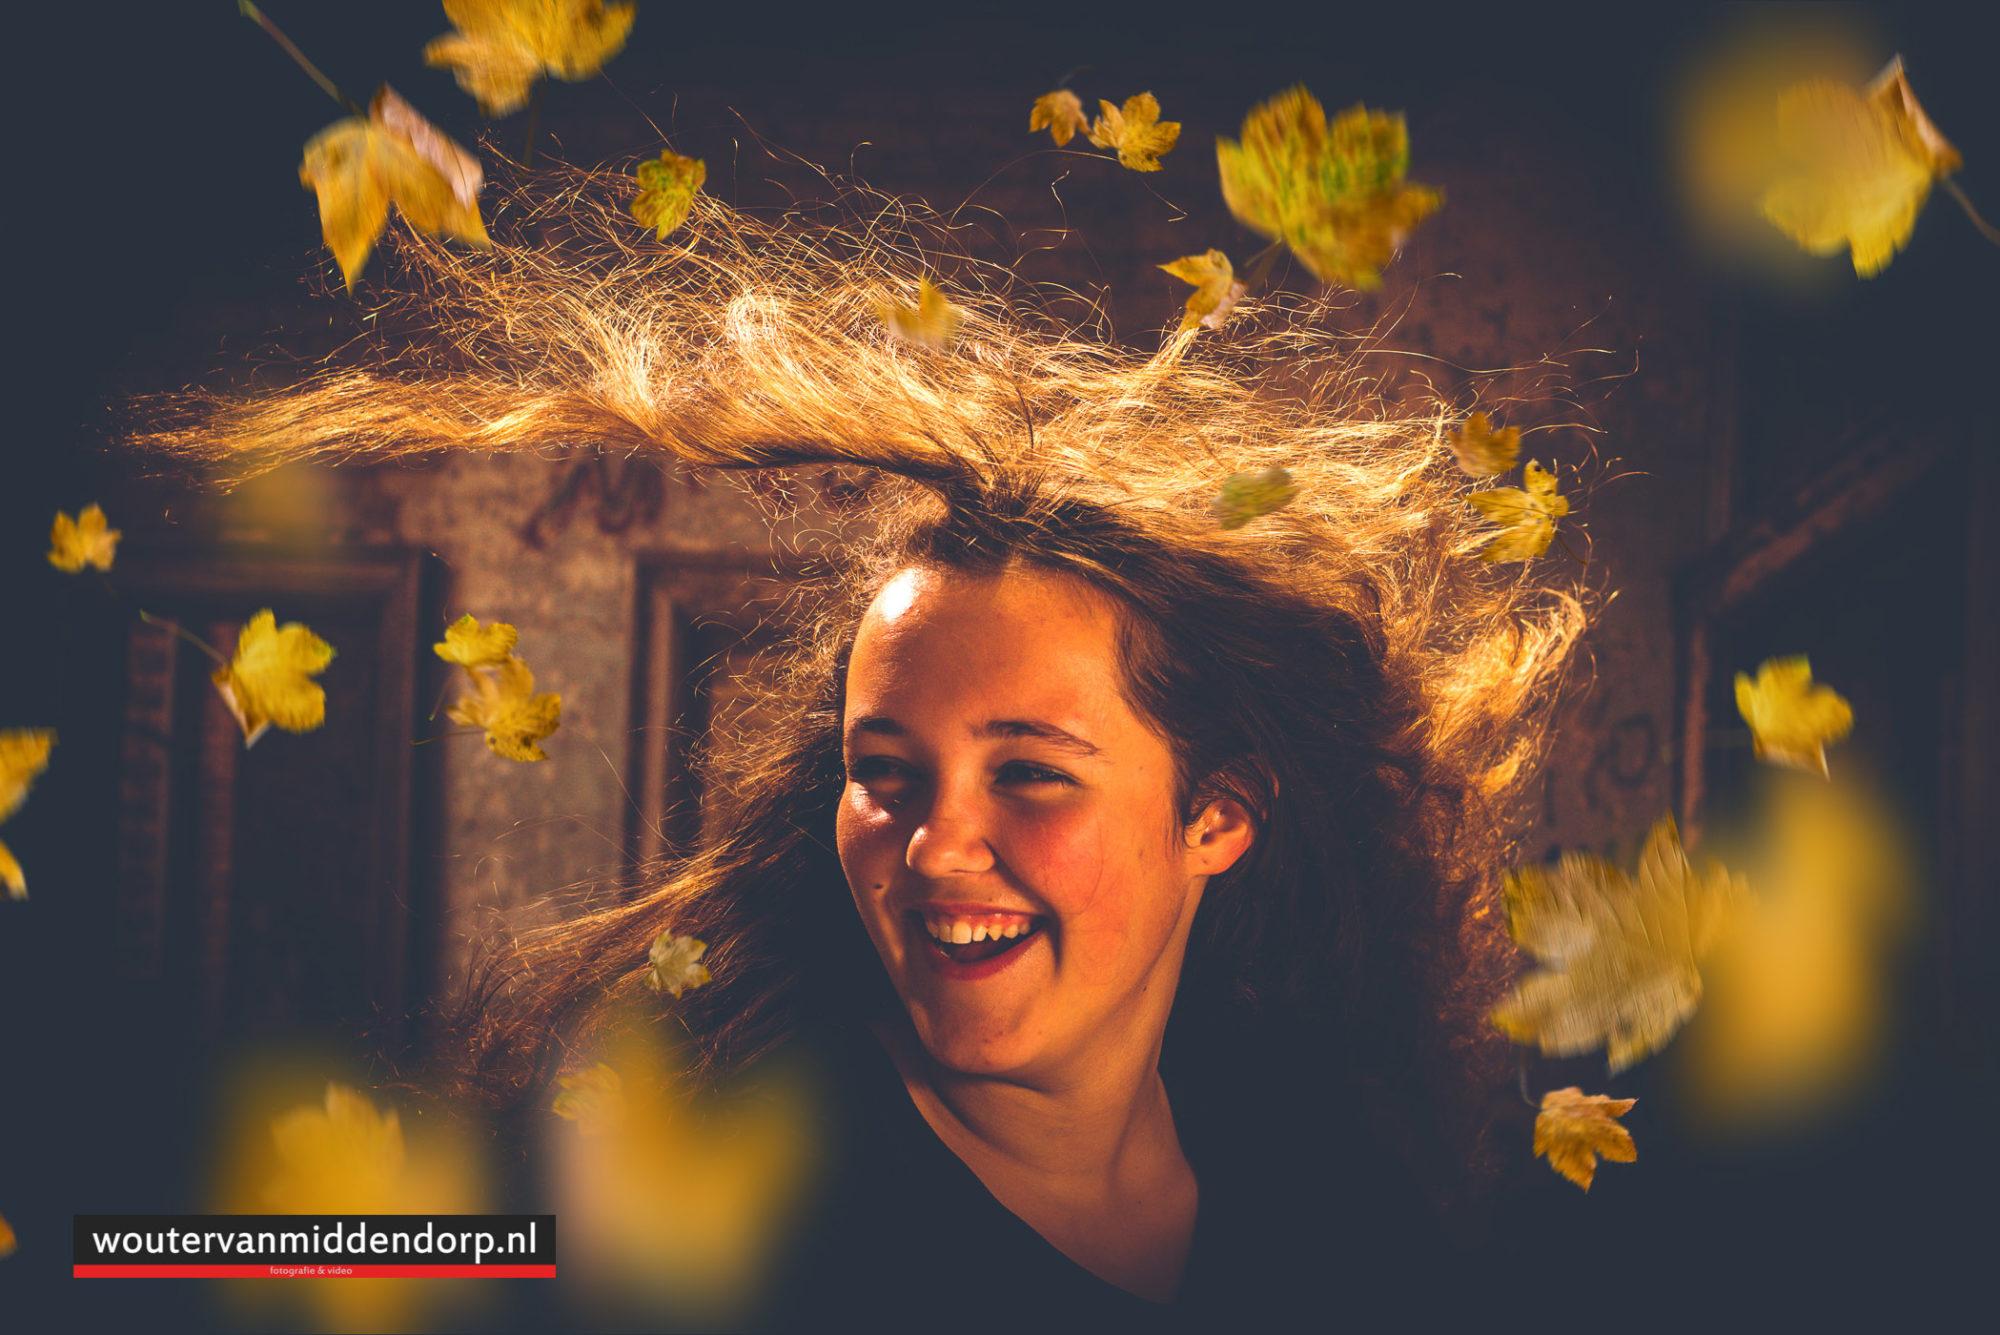 fotograaf Wouter van Middendorp Nunspeet-8